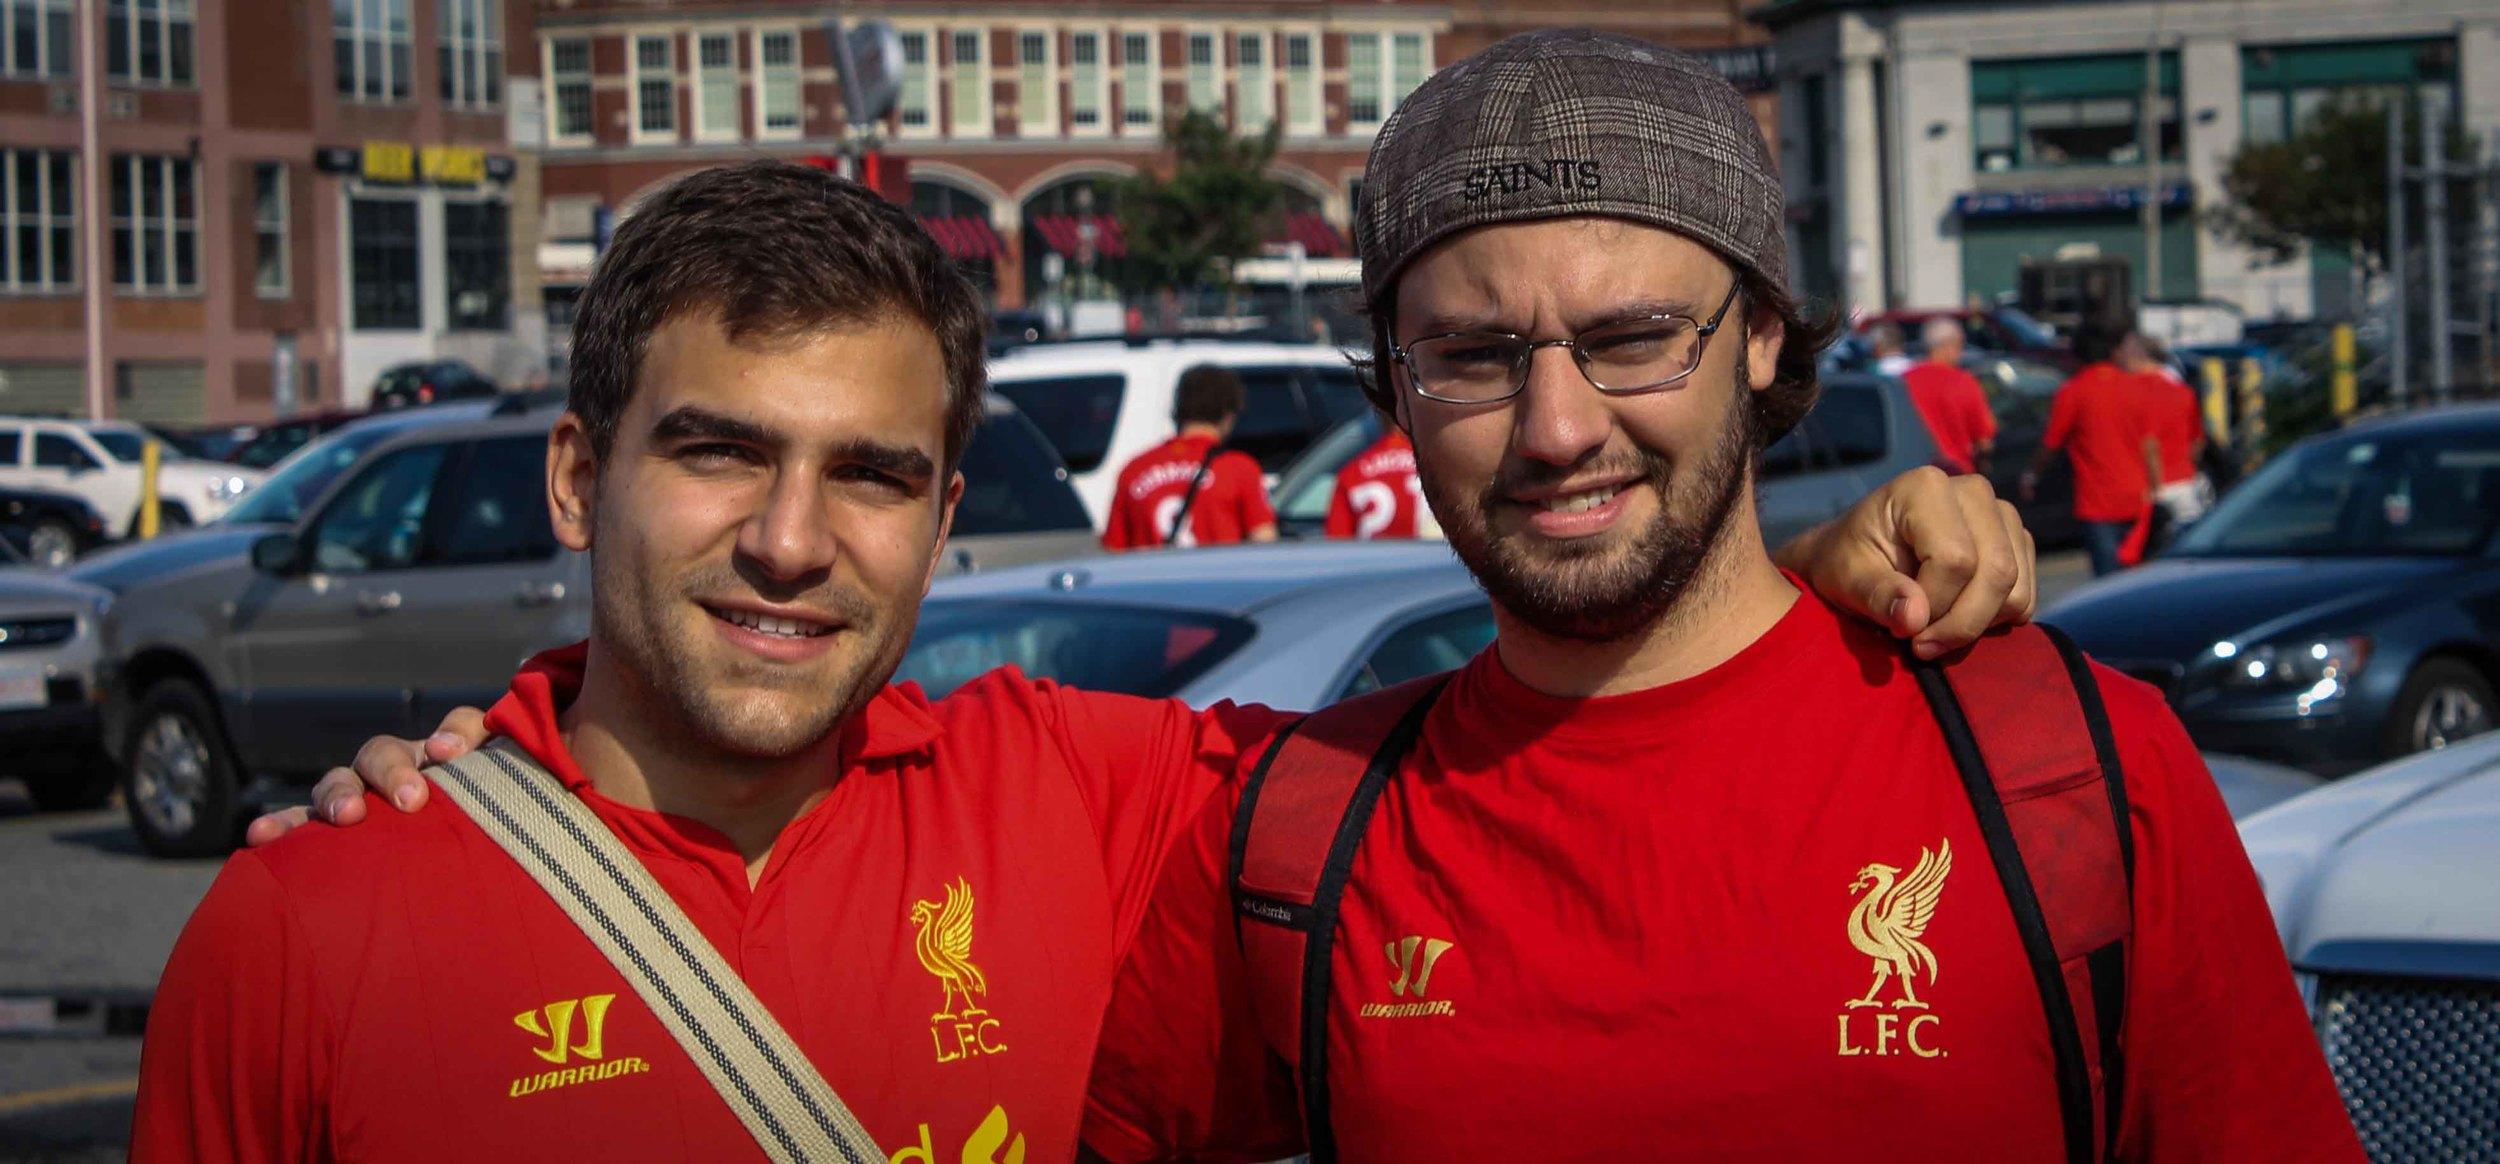 Liverpool vs Roma. Boston Summer 2011